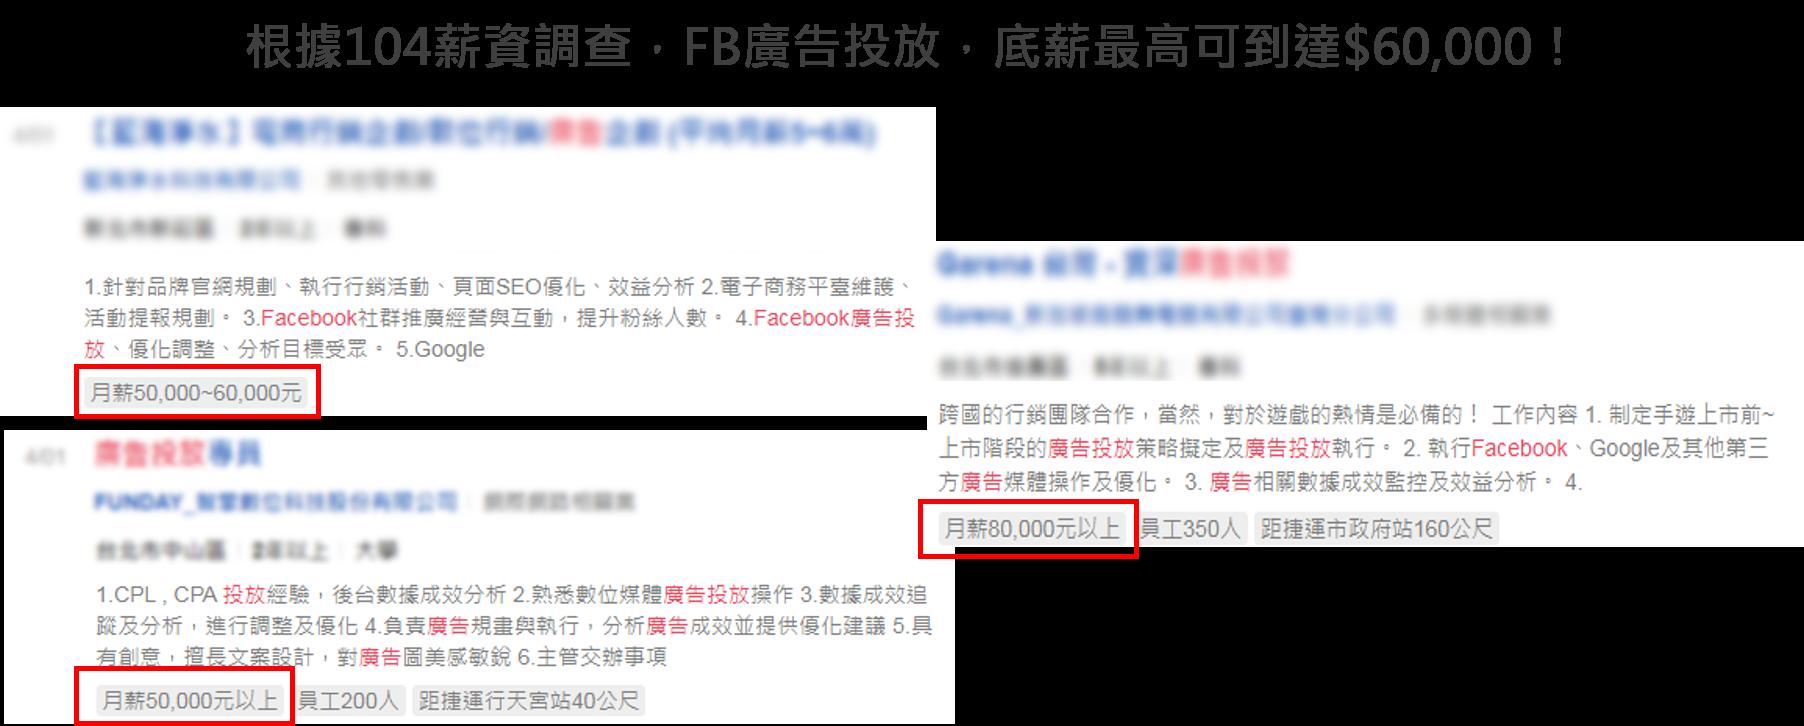 FB廣告投放104薪資